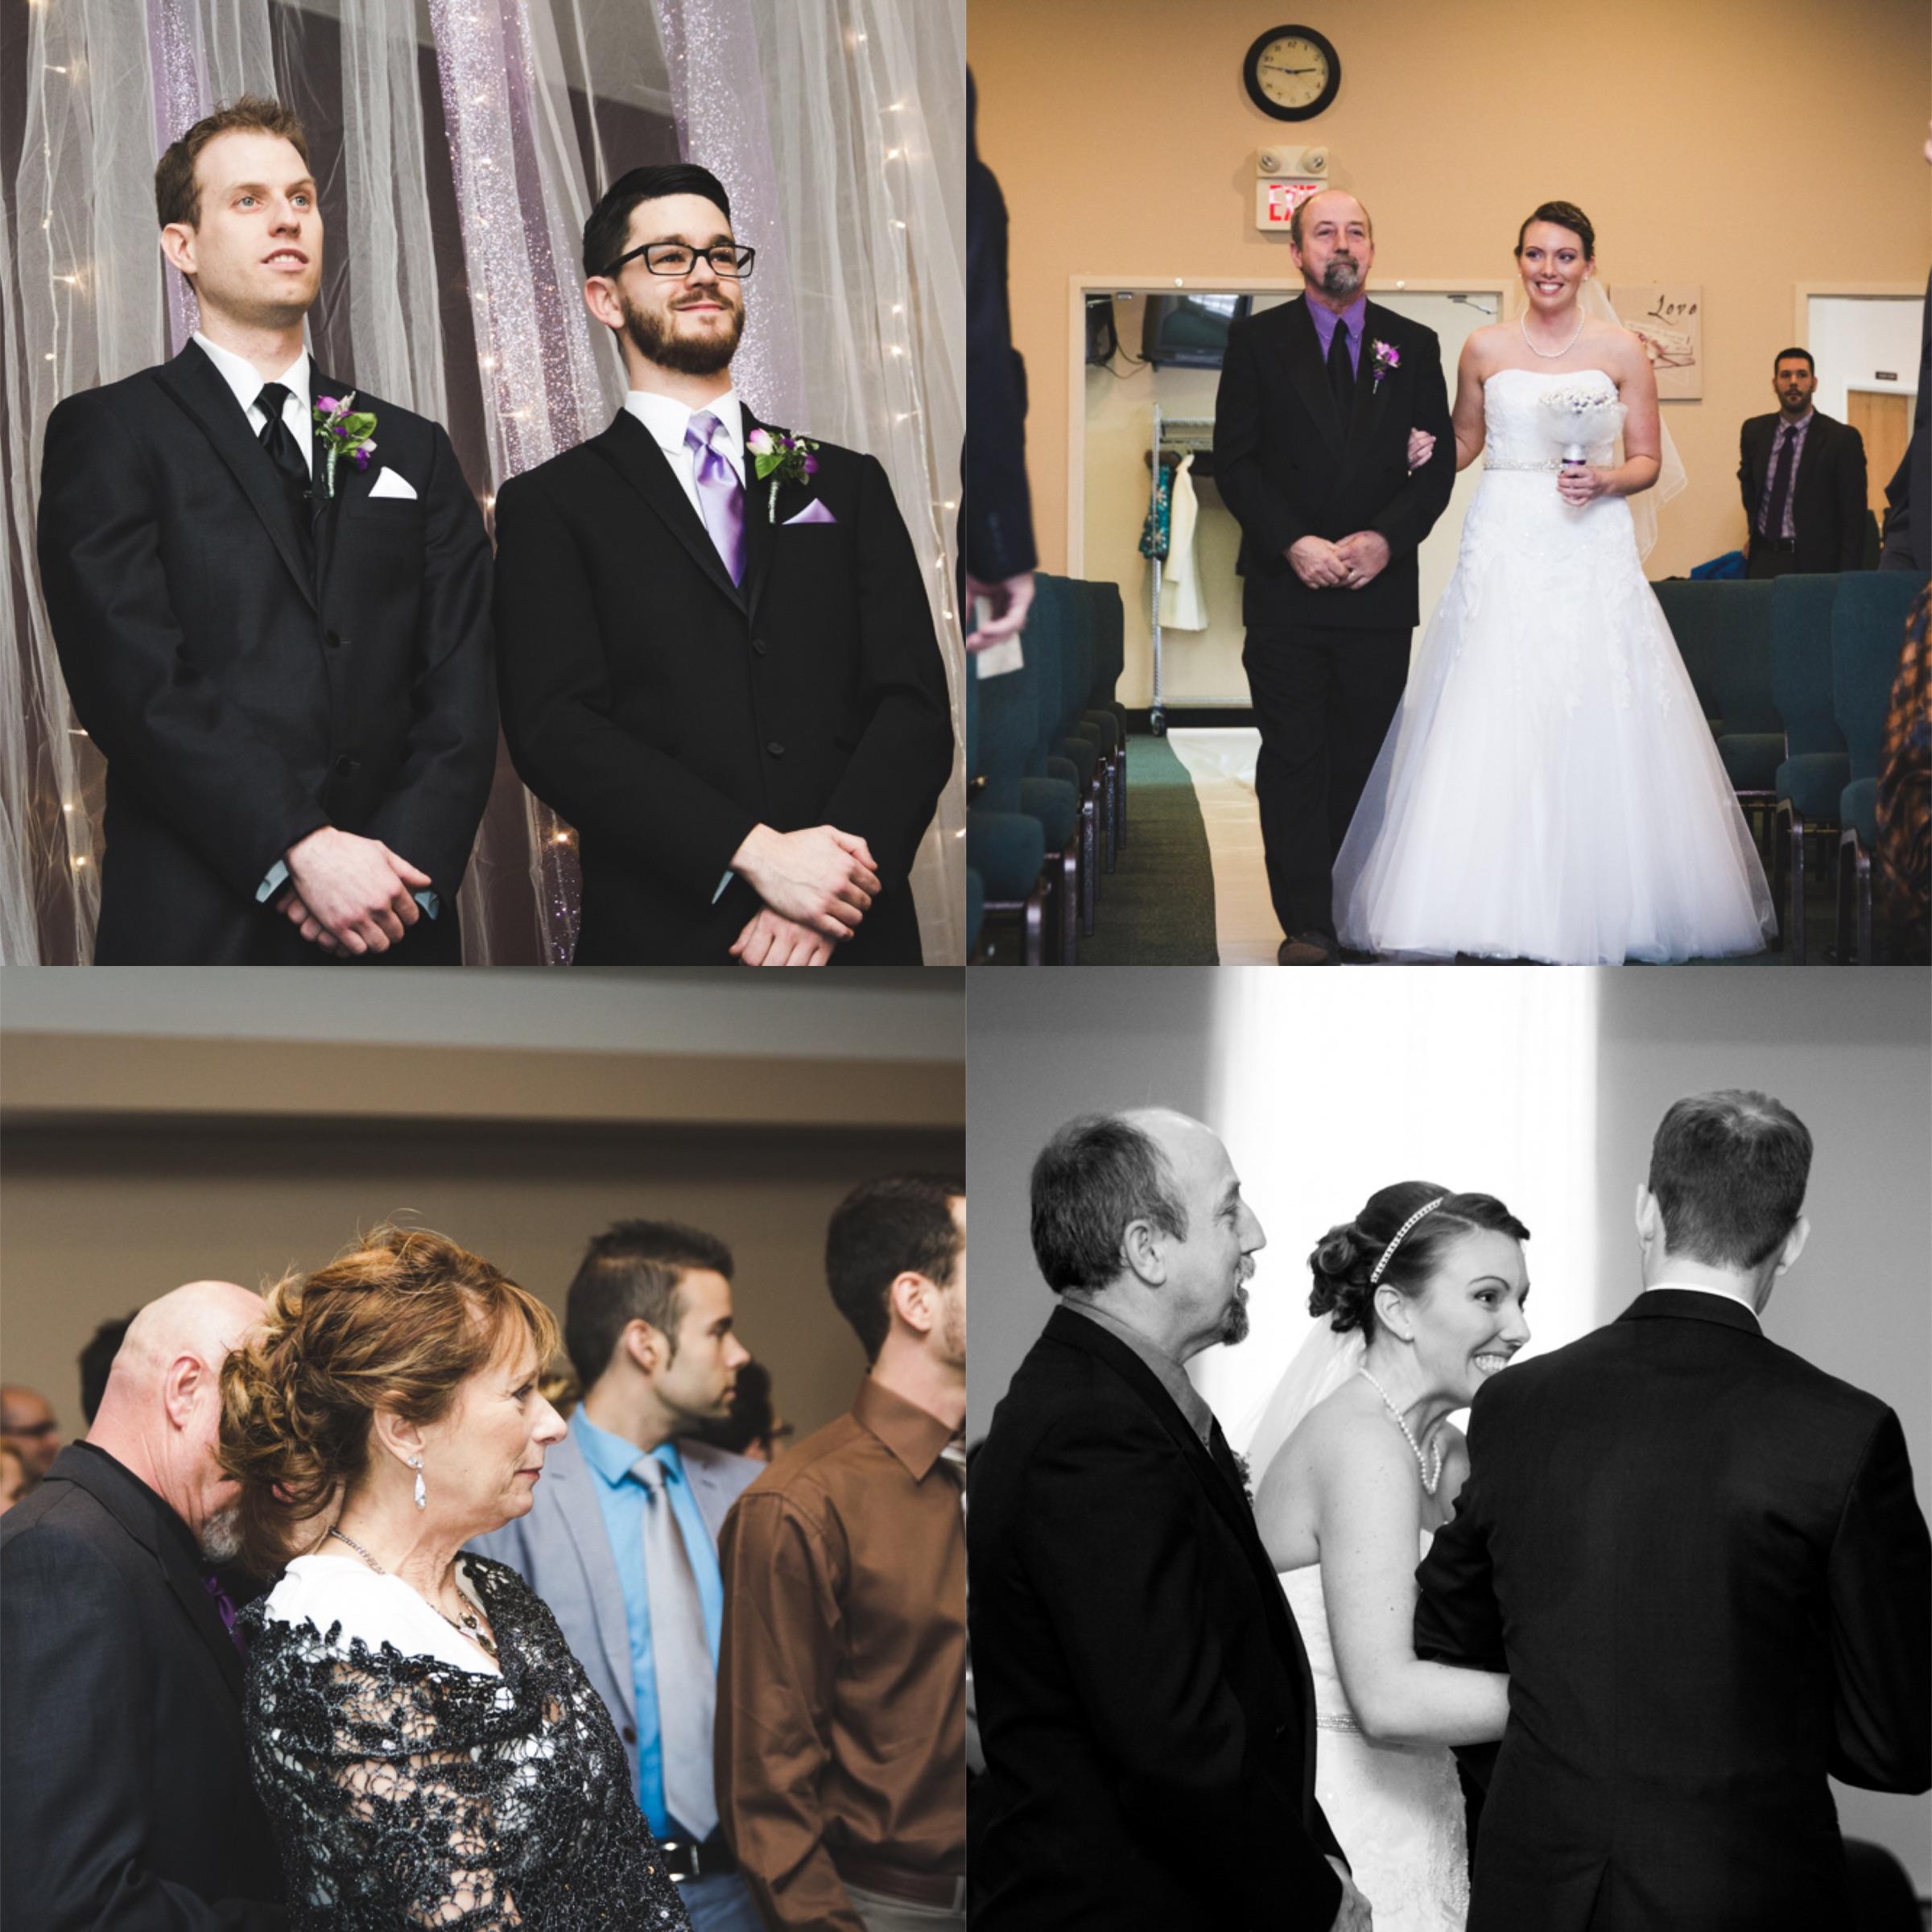 FIRST LOOK OF THE BRIDE REVEAL WEDDING PHOTOS   TORONTO WEDDING PHOTOGRAPHER.jpg